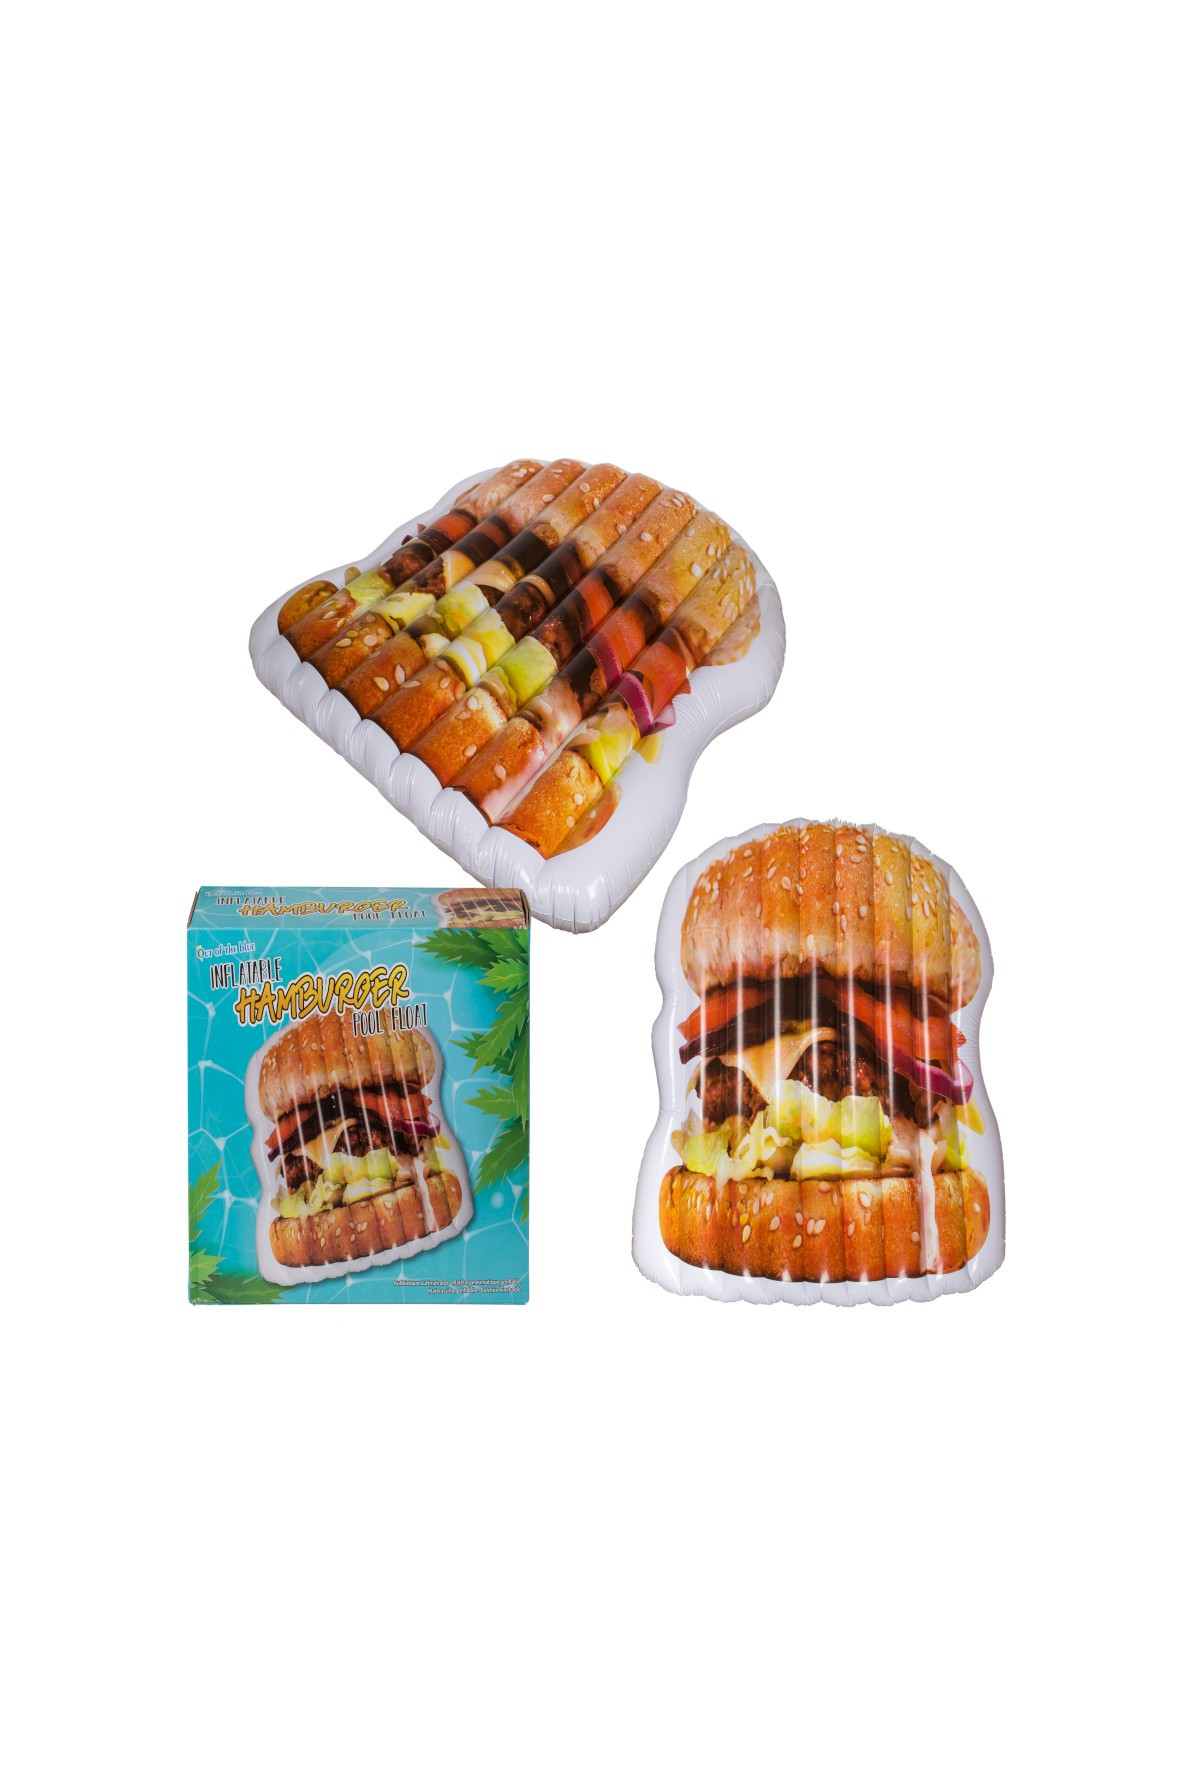 Materac do pływania, pływak basenowy - hamburger - 29x24x9 cm